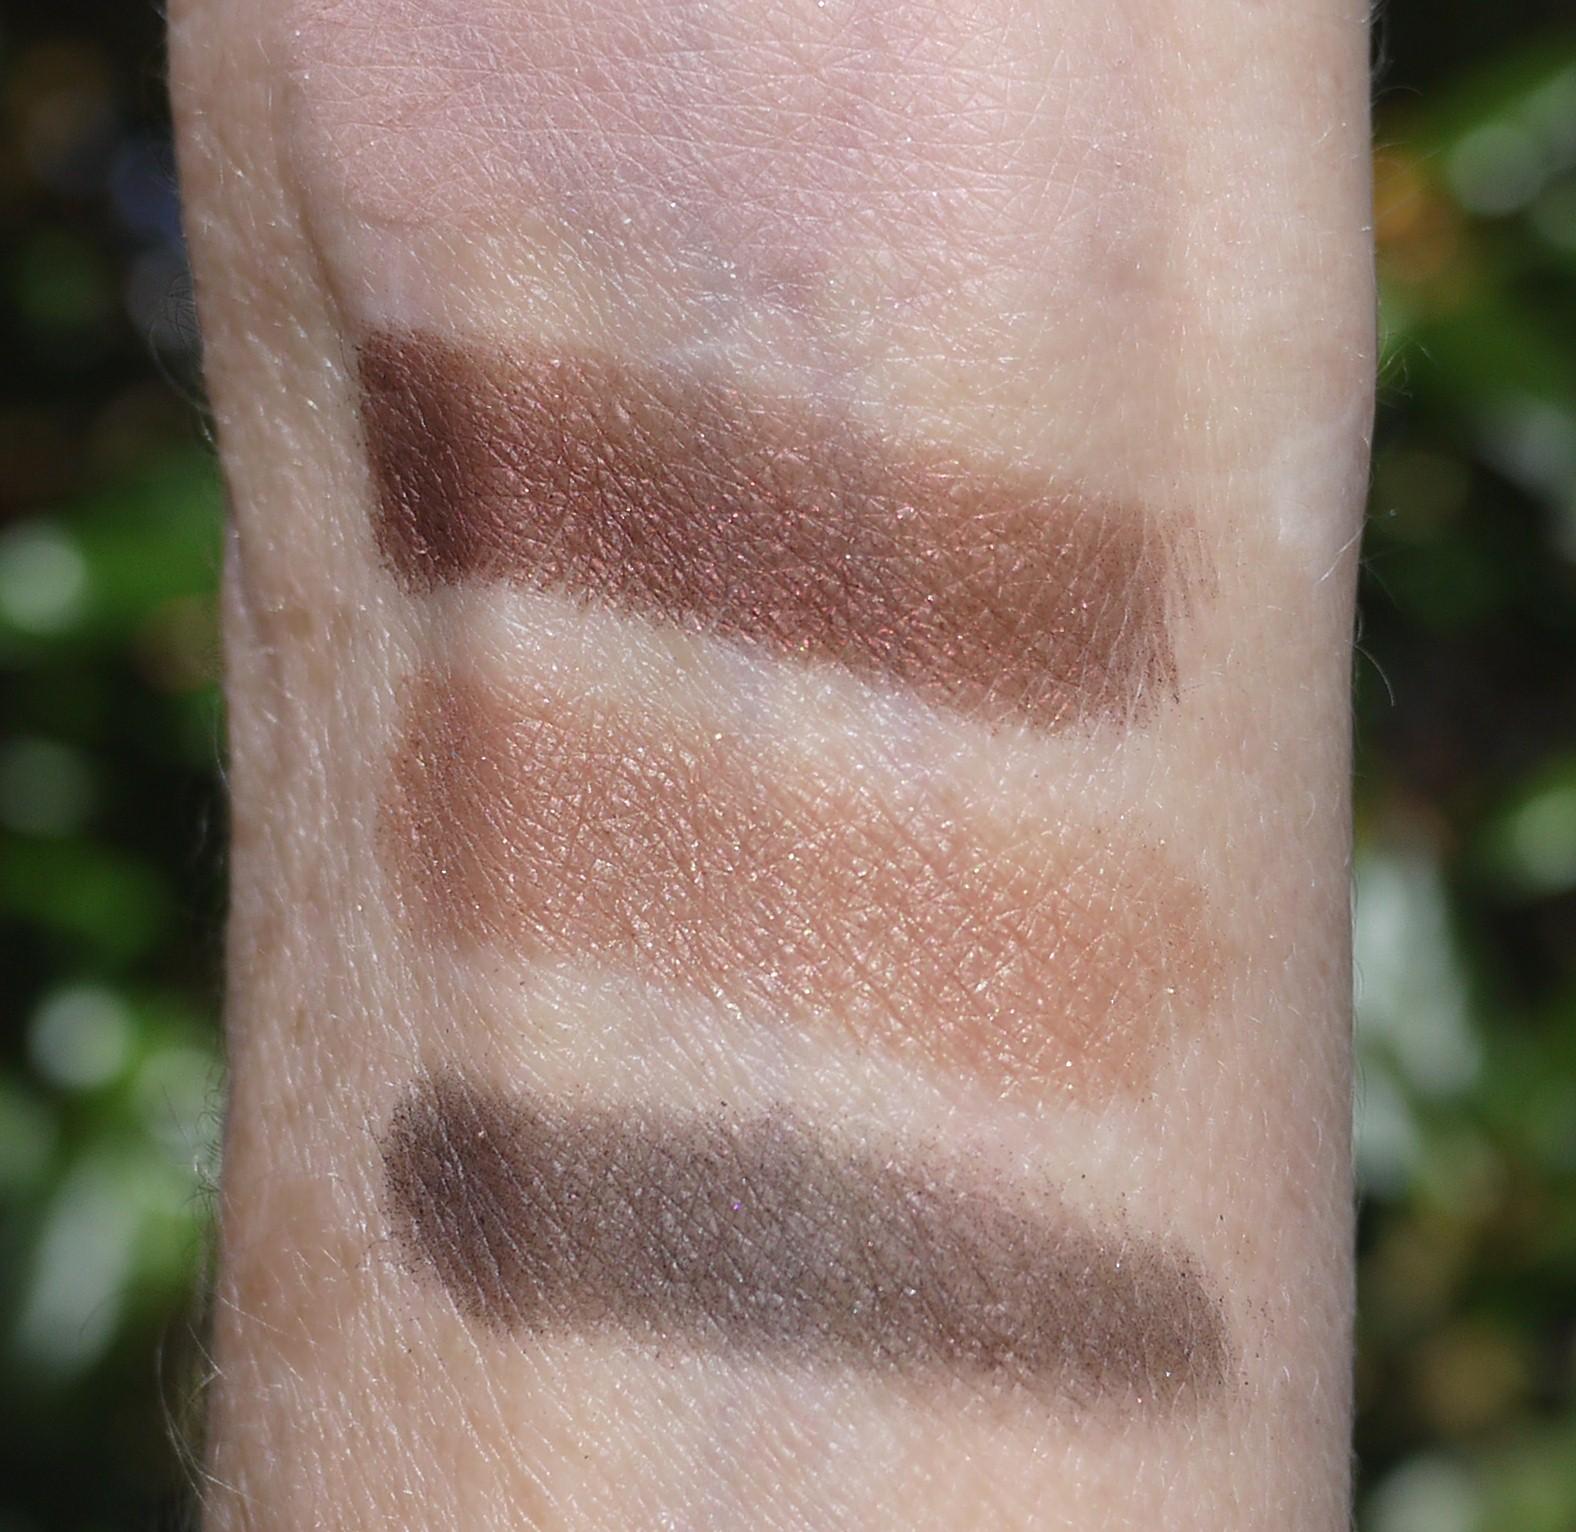 Cellular Treatment Powder Blush by la prairie #11